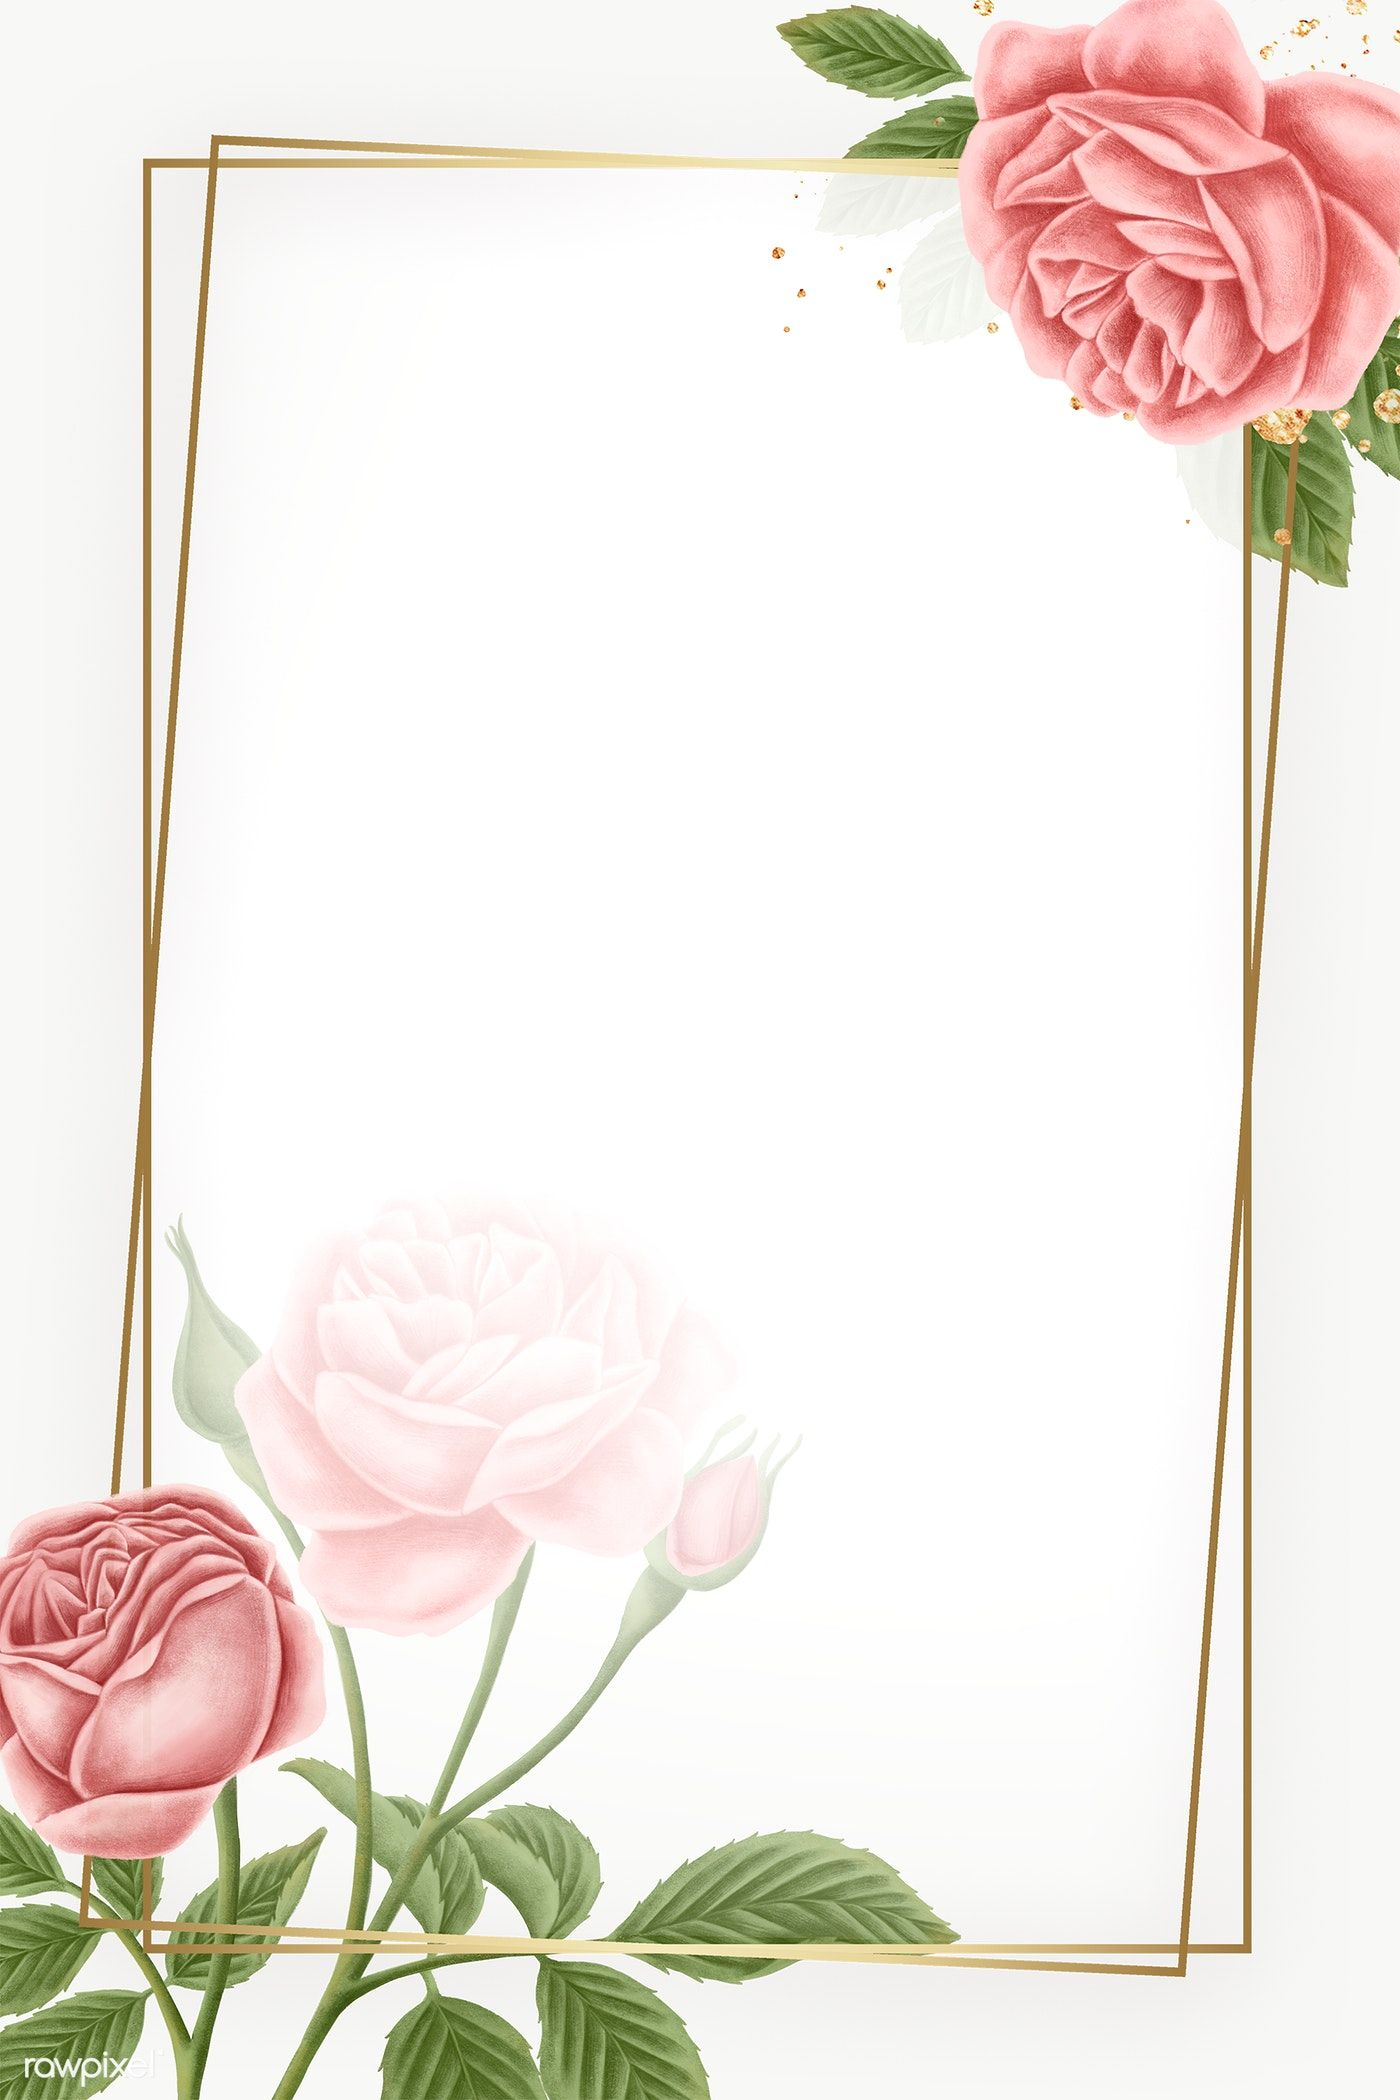 Download Premium Png Of Red Rose Frame Transparent Png 2221563 In 2020 Rose Frame Flower Frame Png Flower Phone Wallpaper